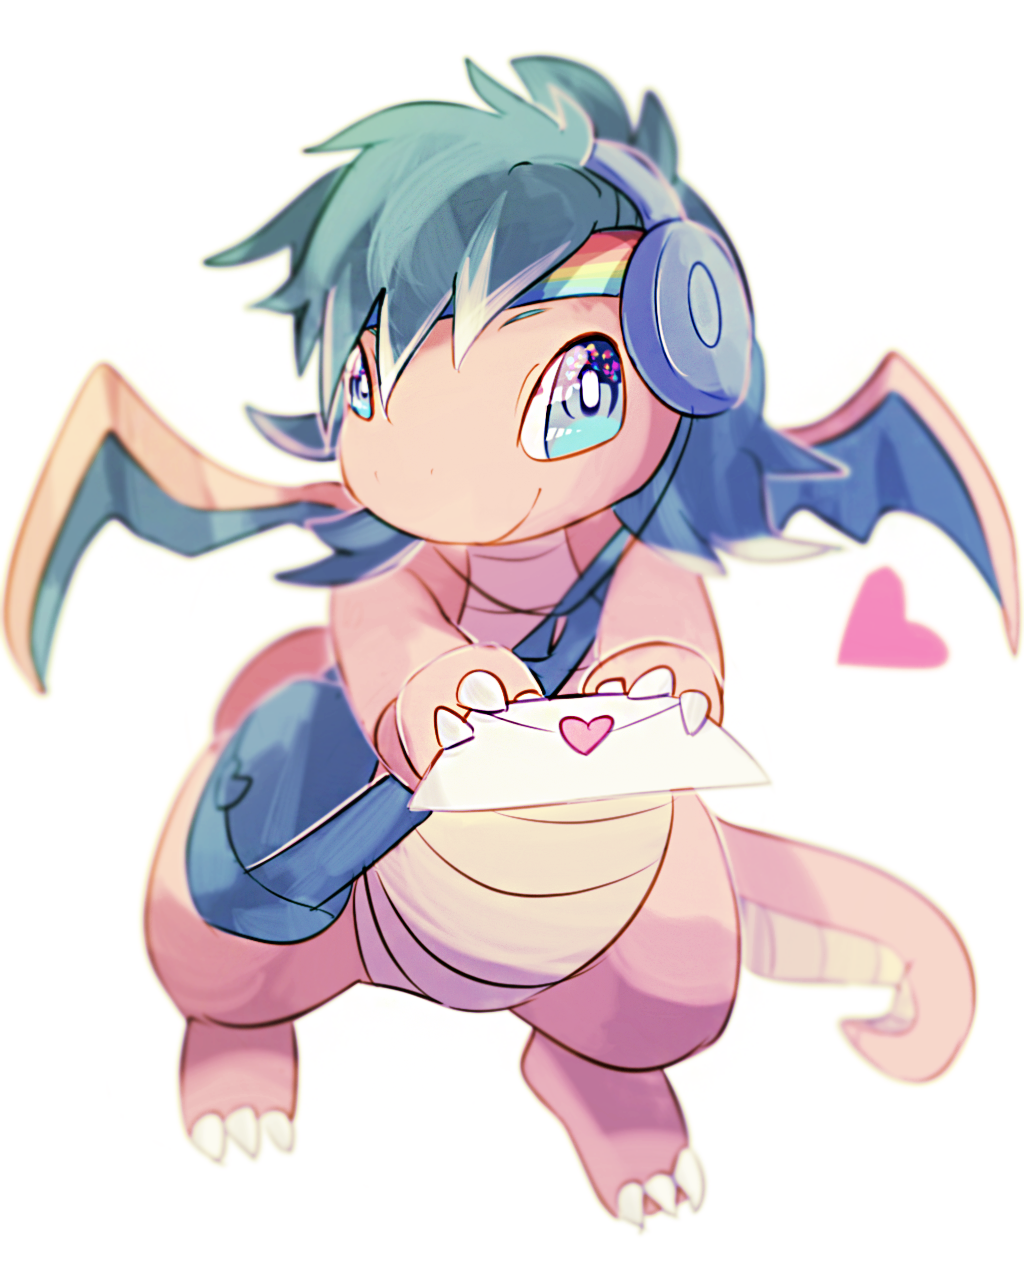 Dragonite love letter delivery!